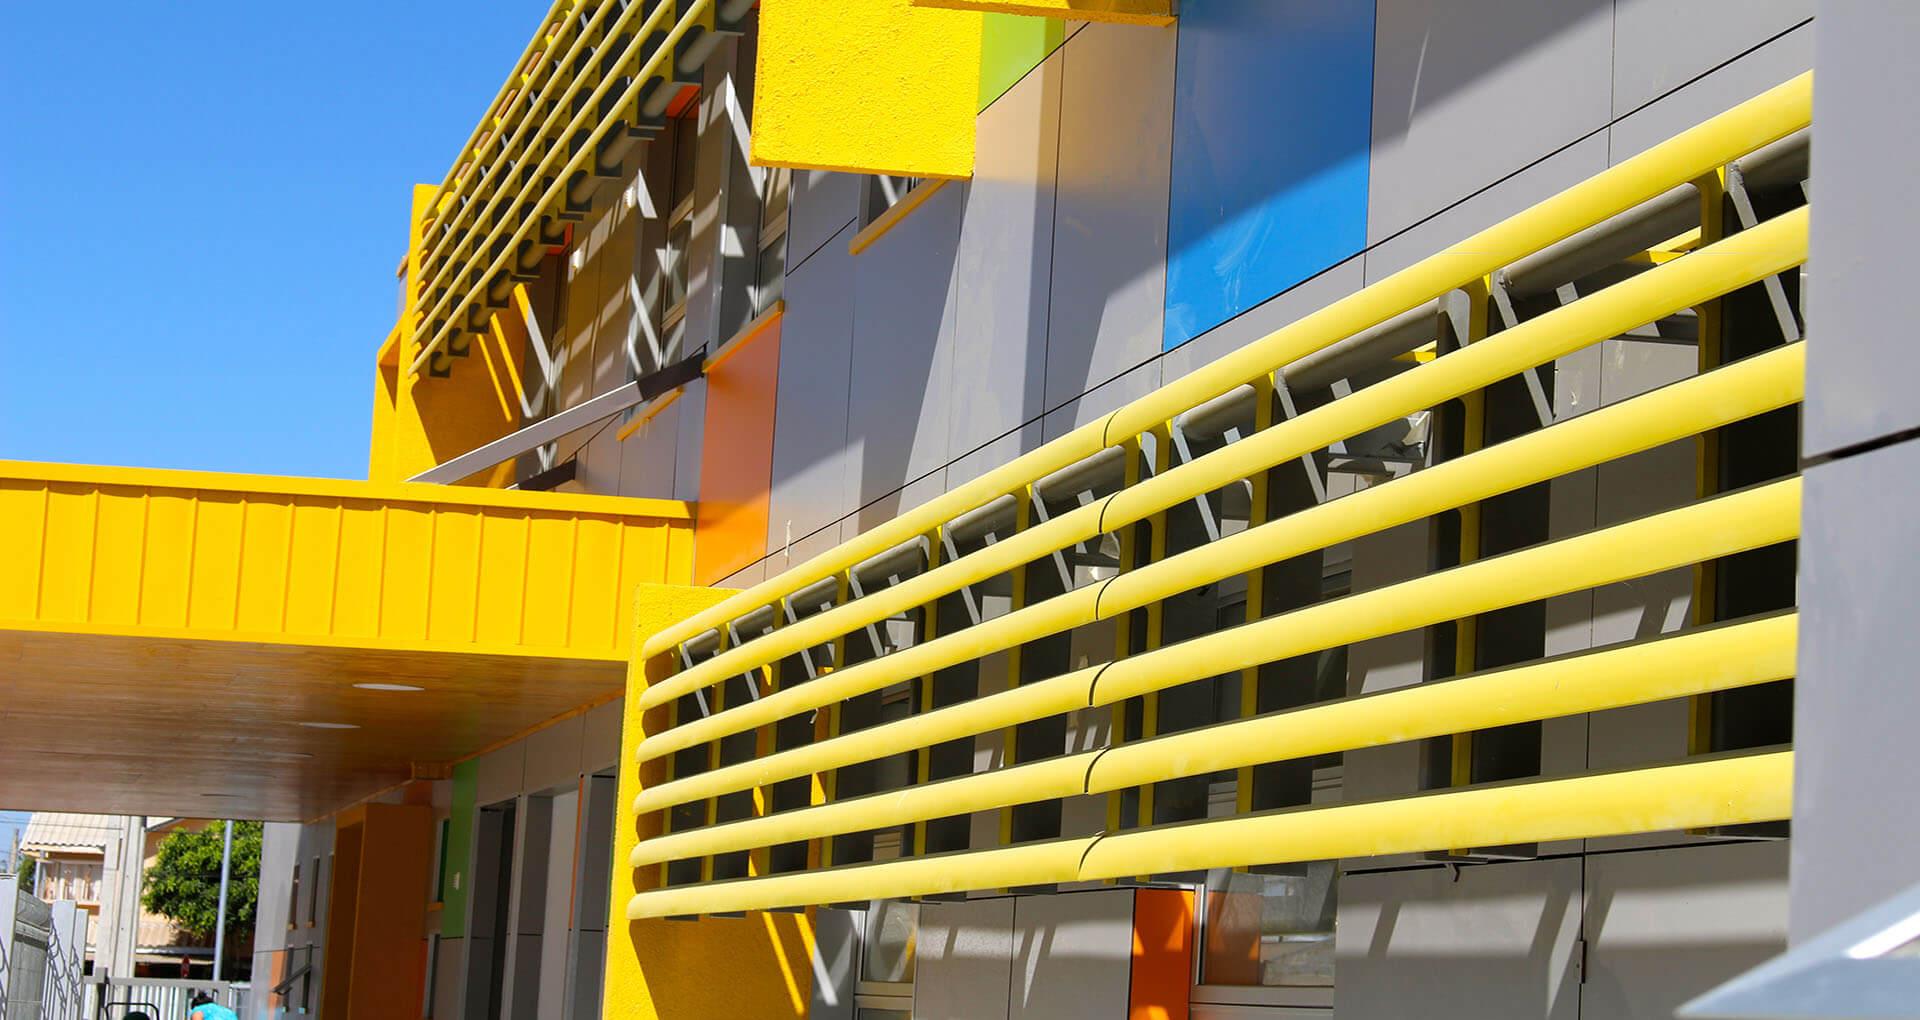 Cefam-Ovalle-Fray-Jorge-Fachada-Constructora-Rencoret